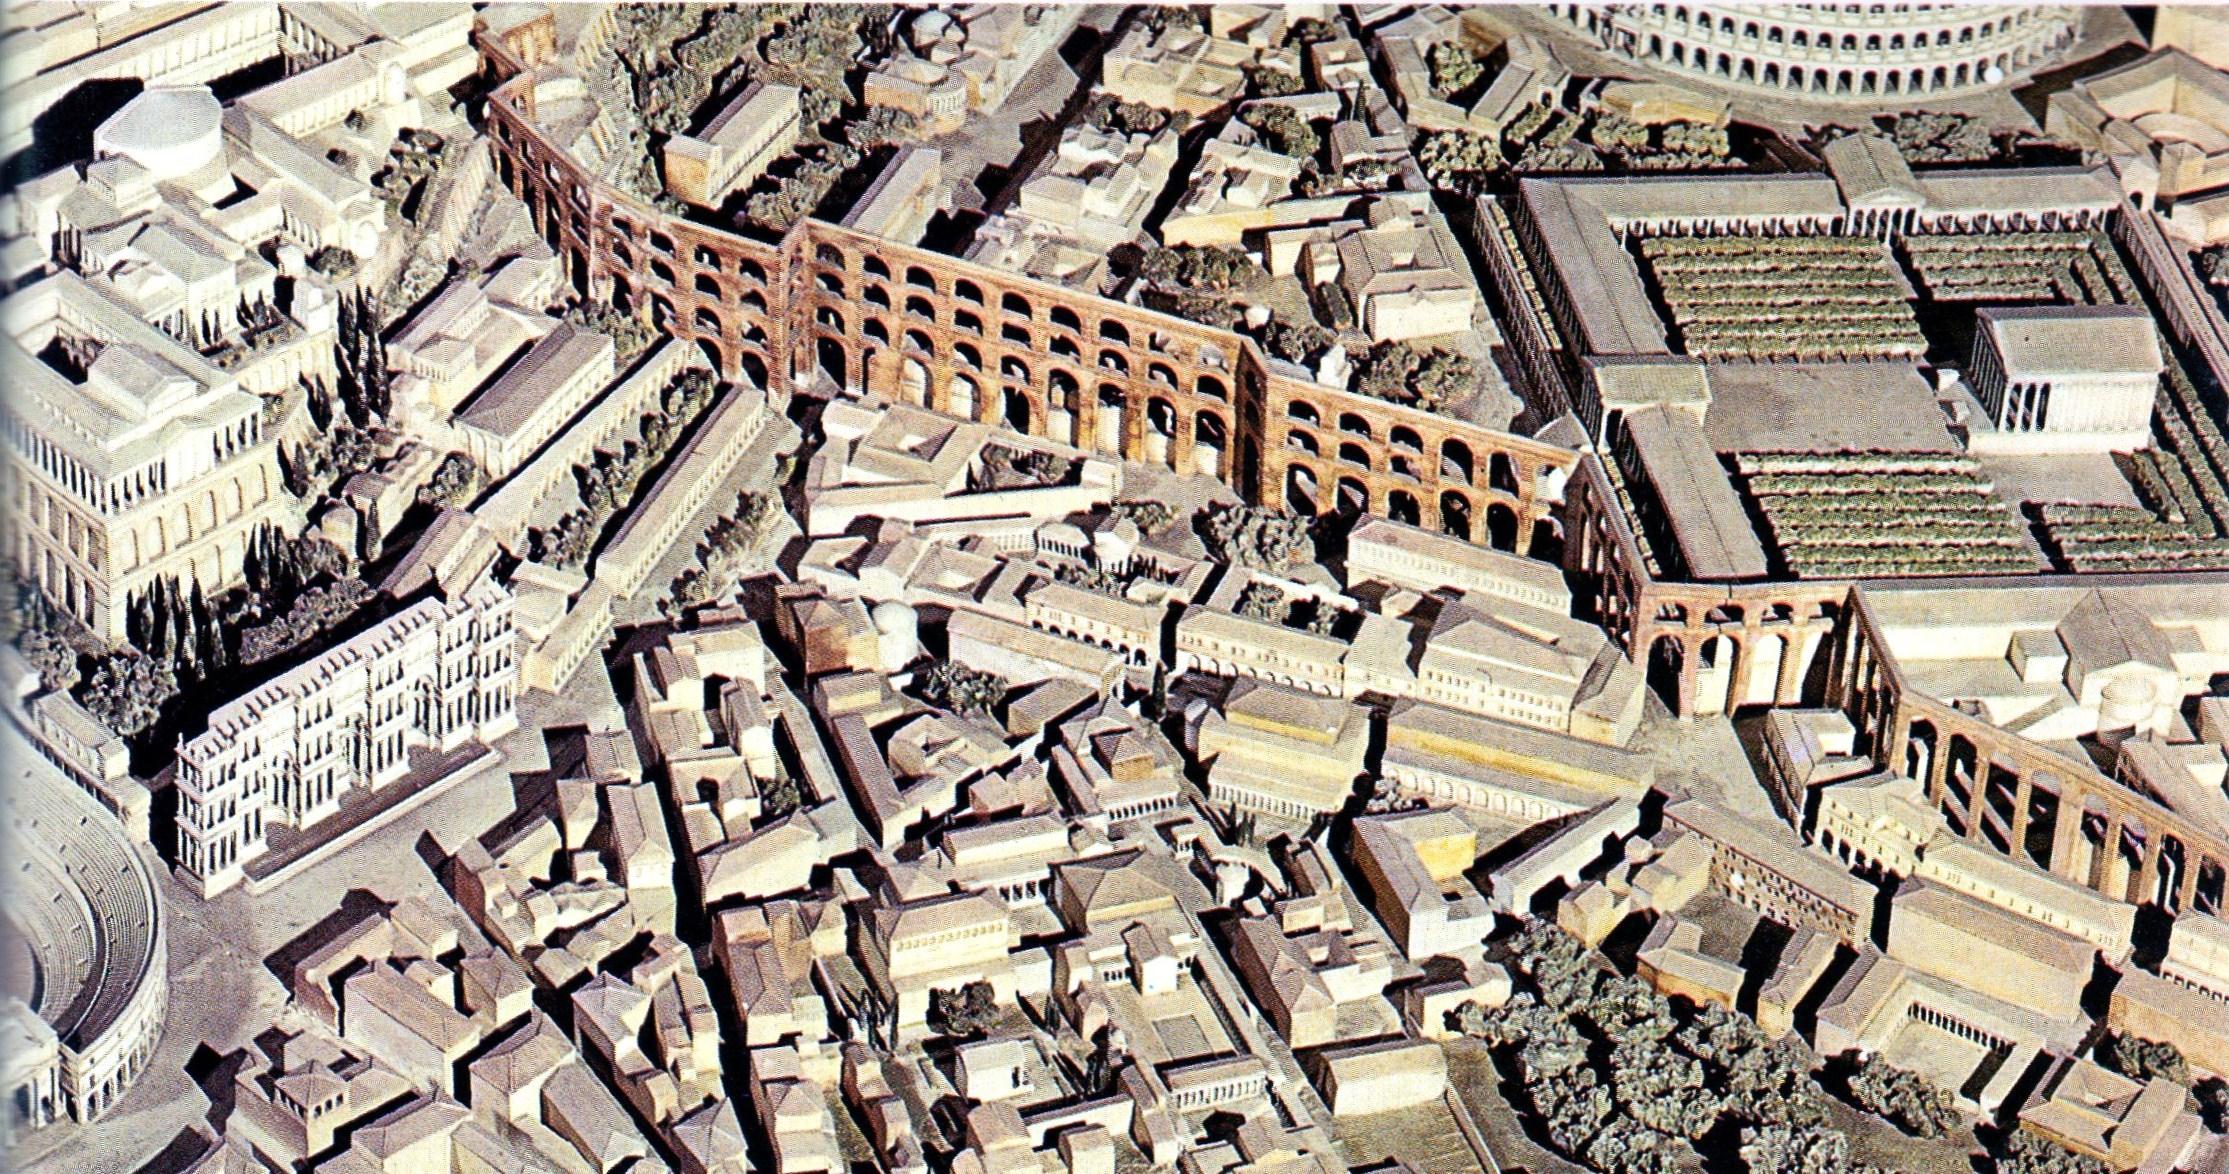 Vergine per impero romano 1983 with pauline teutscher - 5 3